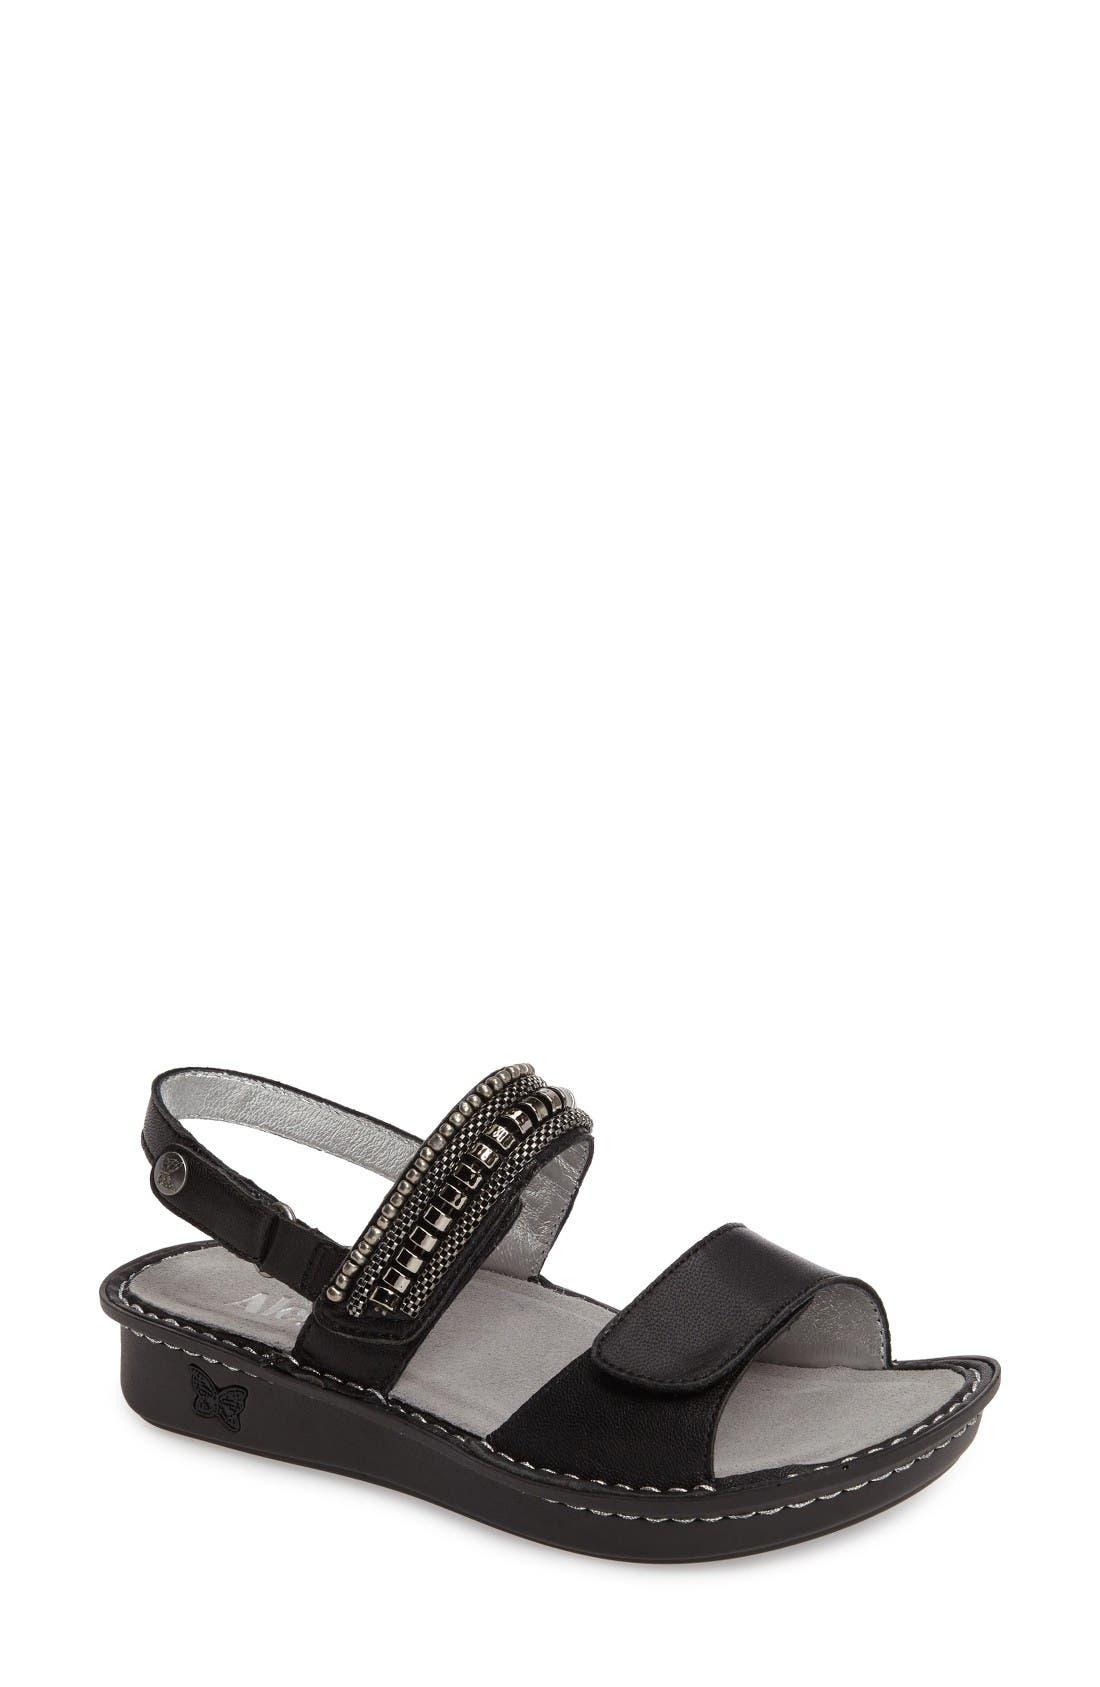 ALEGRIA 'Verona' Sandal